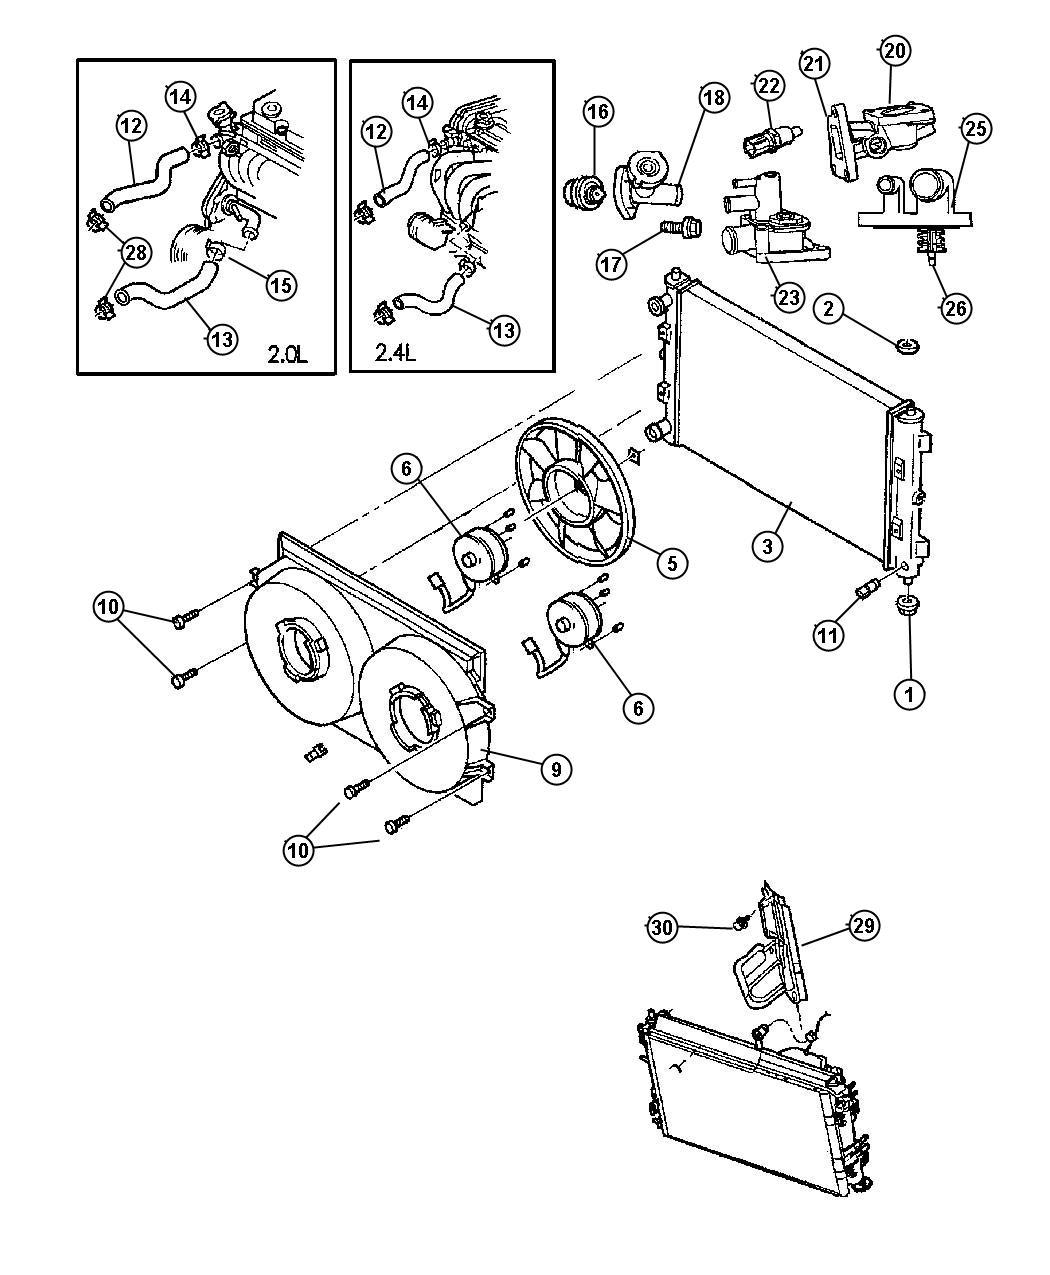 Dodge Stratus Screw. Decking bracket. M6x1.0. Shroud